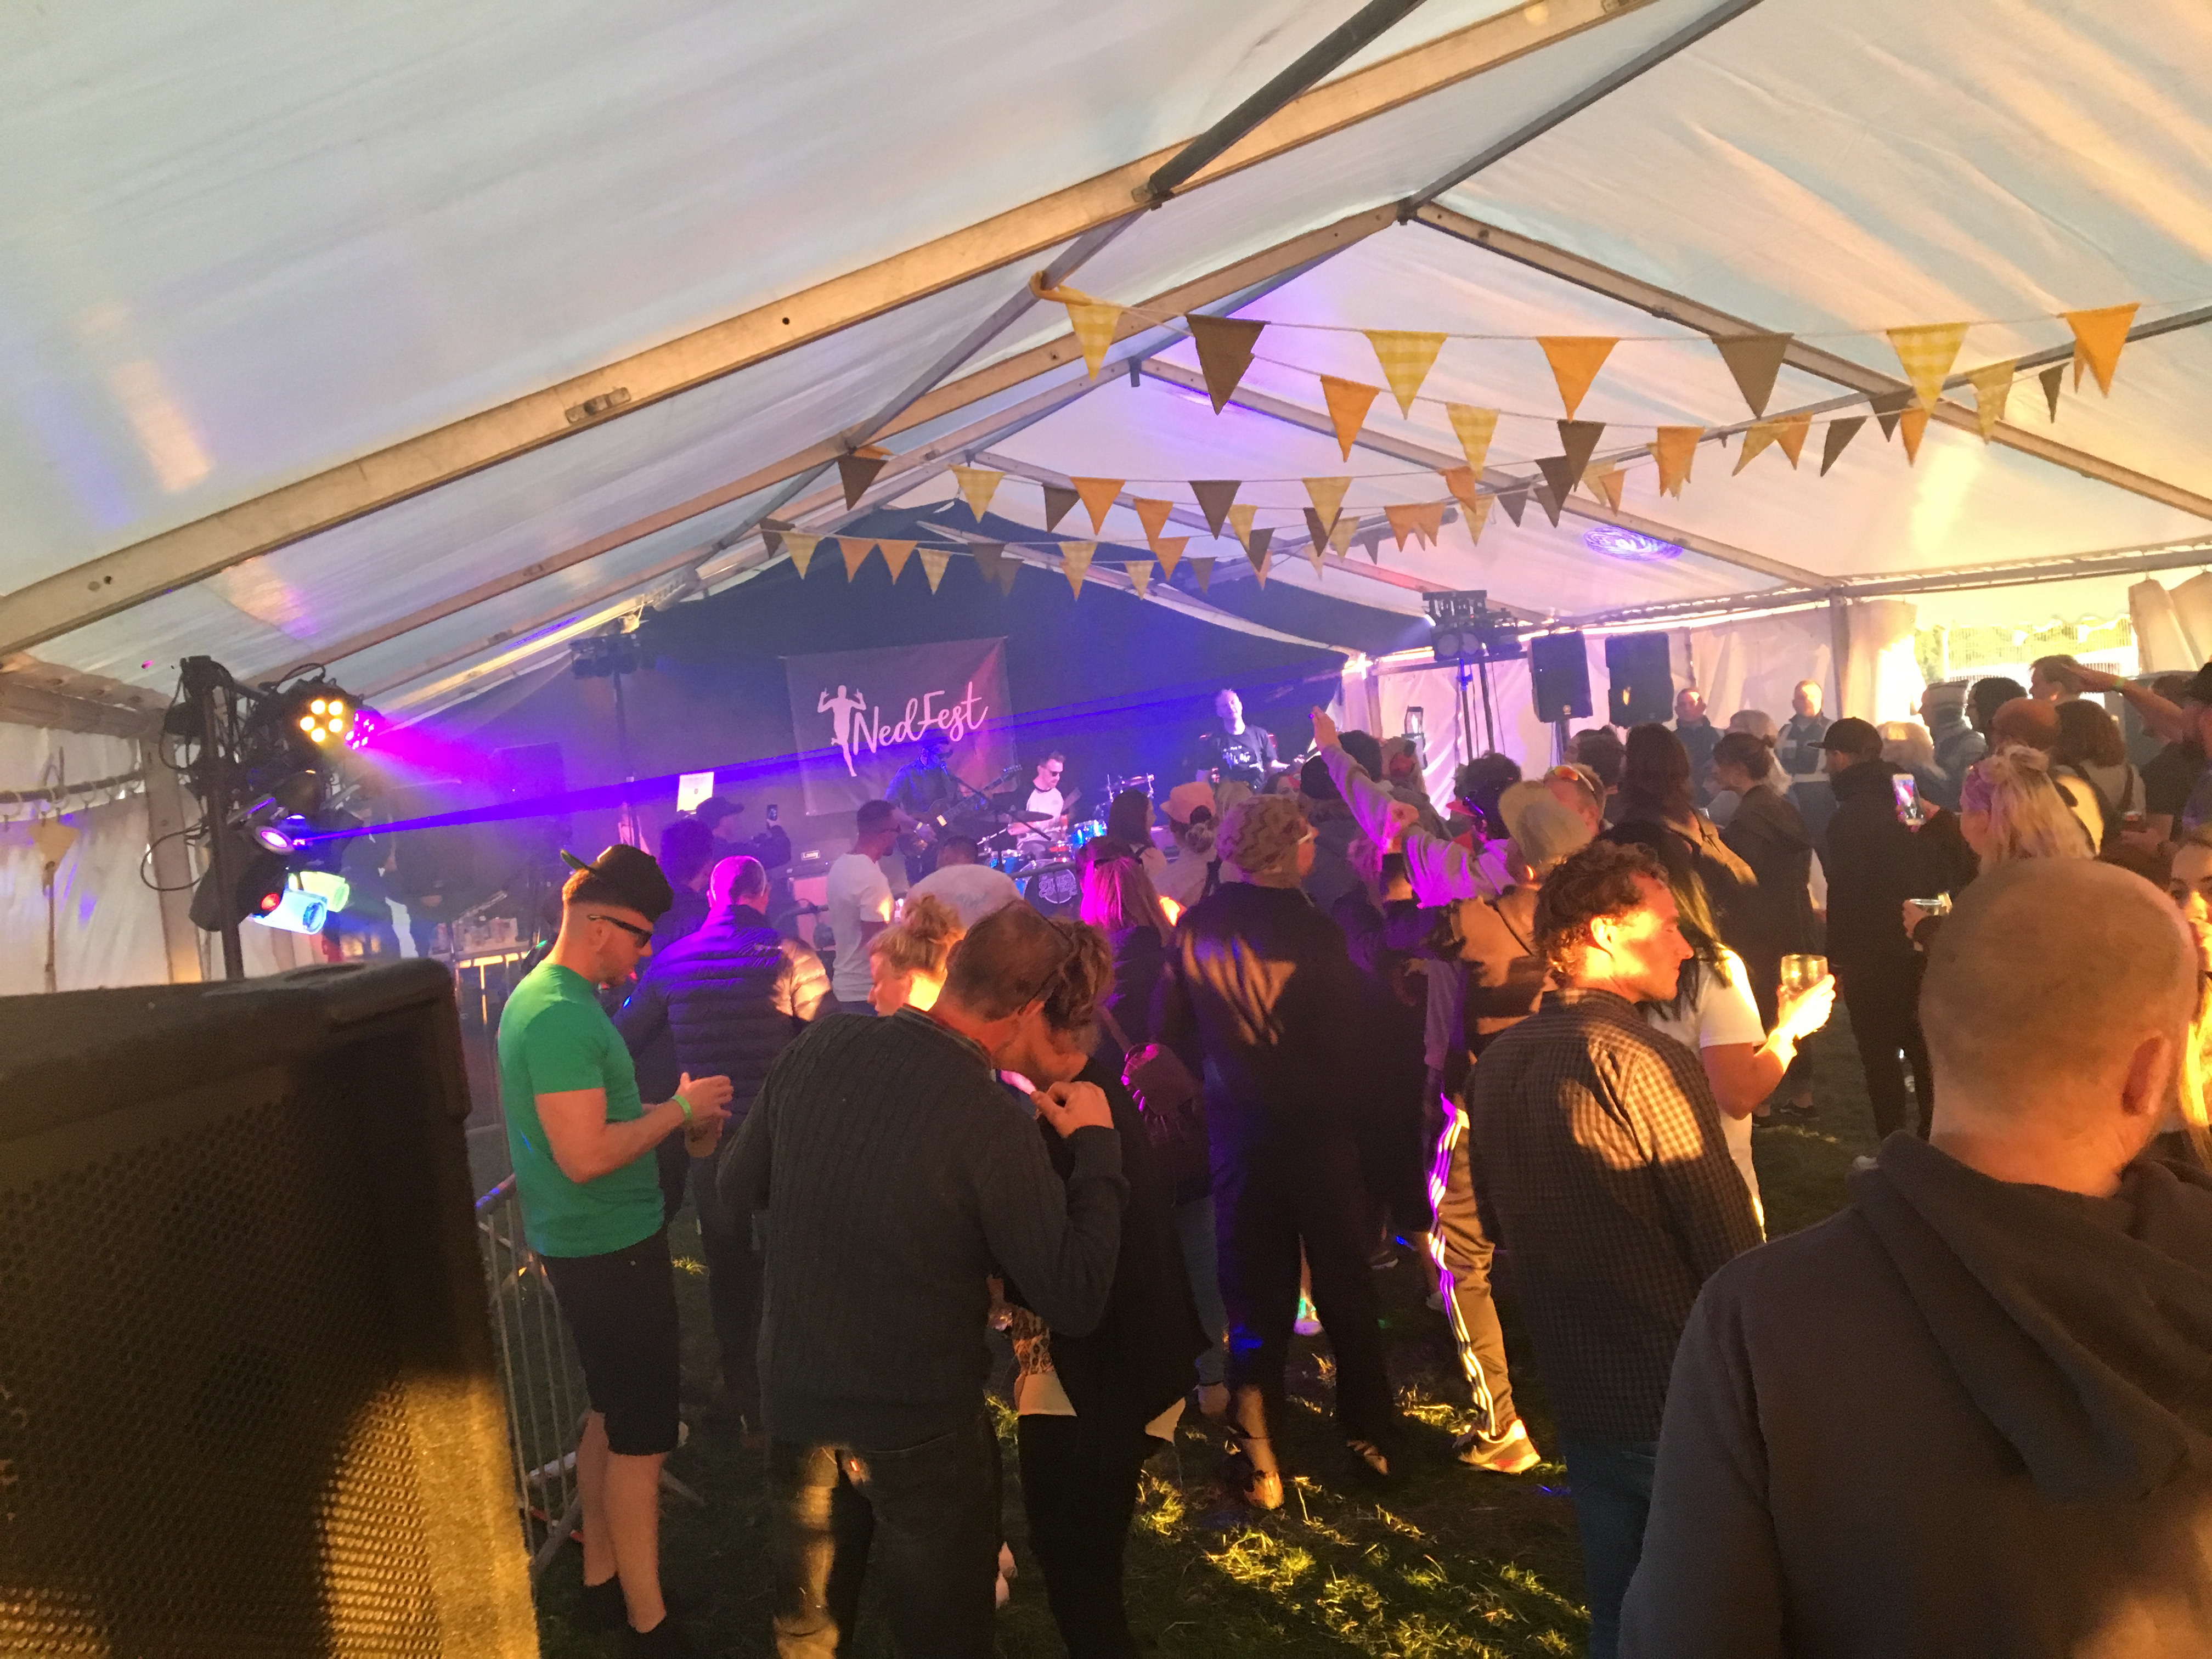 Nedfest Festival marquee, Tamworth